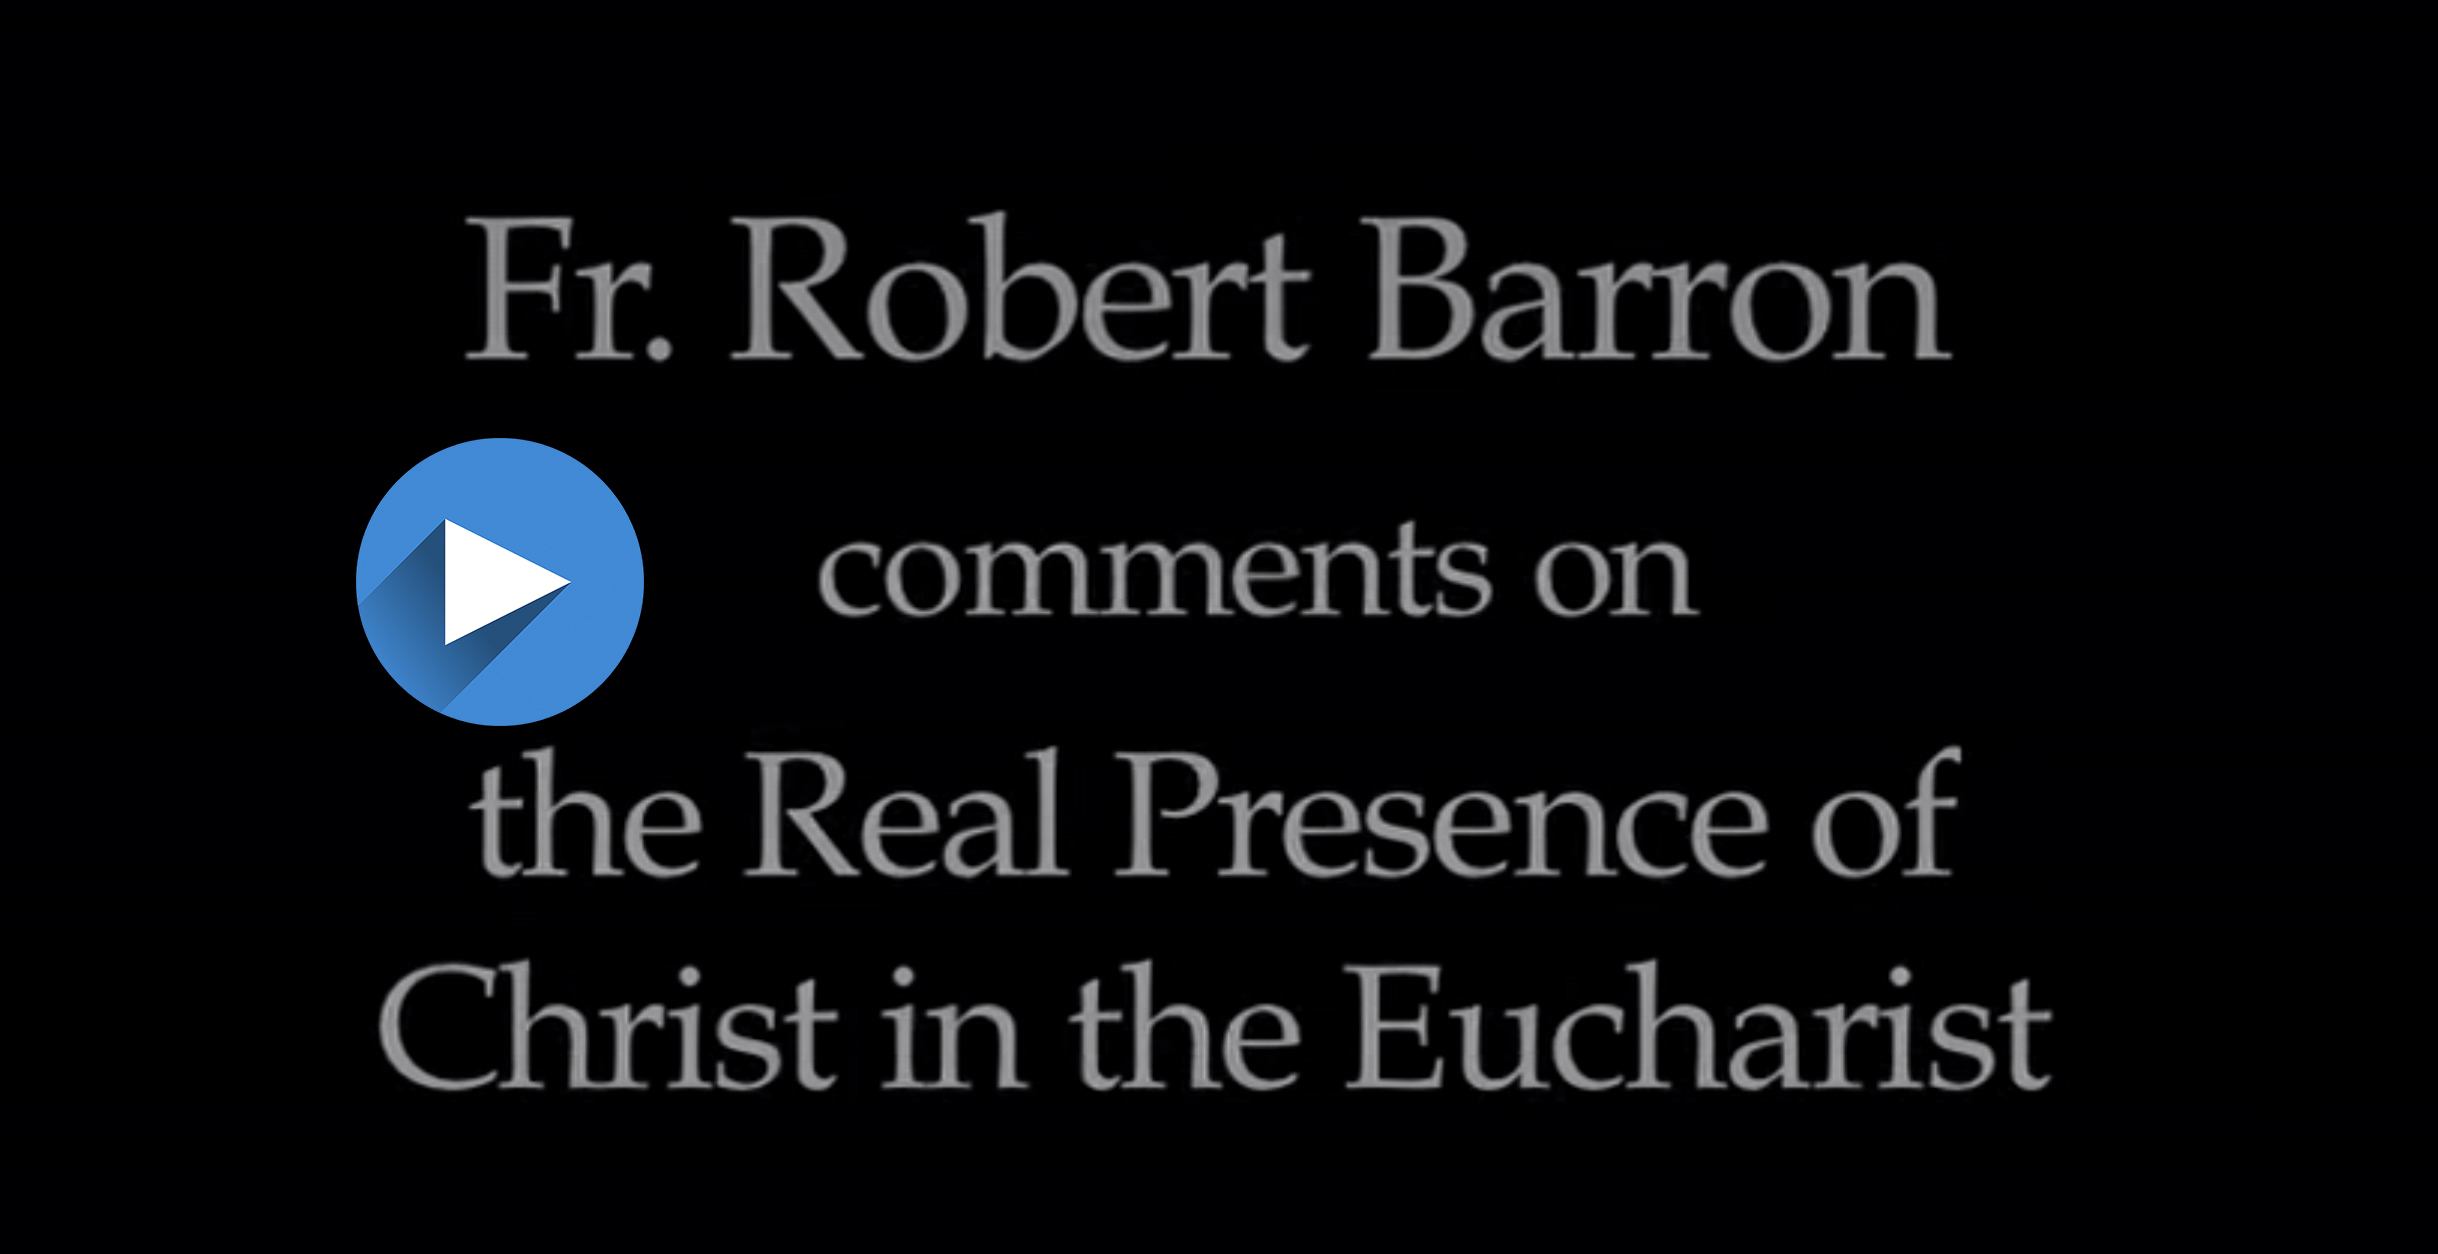 EUCHARIST VIDEO BARRON COVER with arrow.jpg